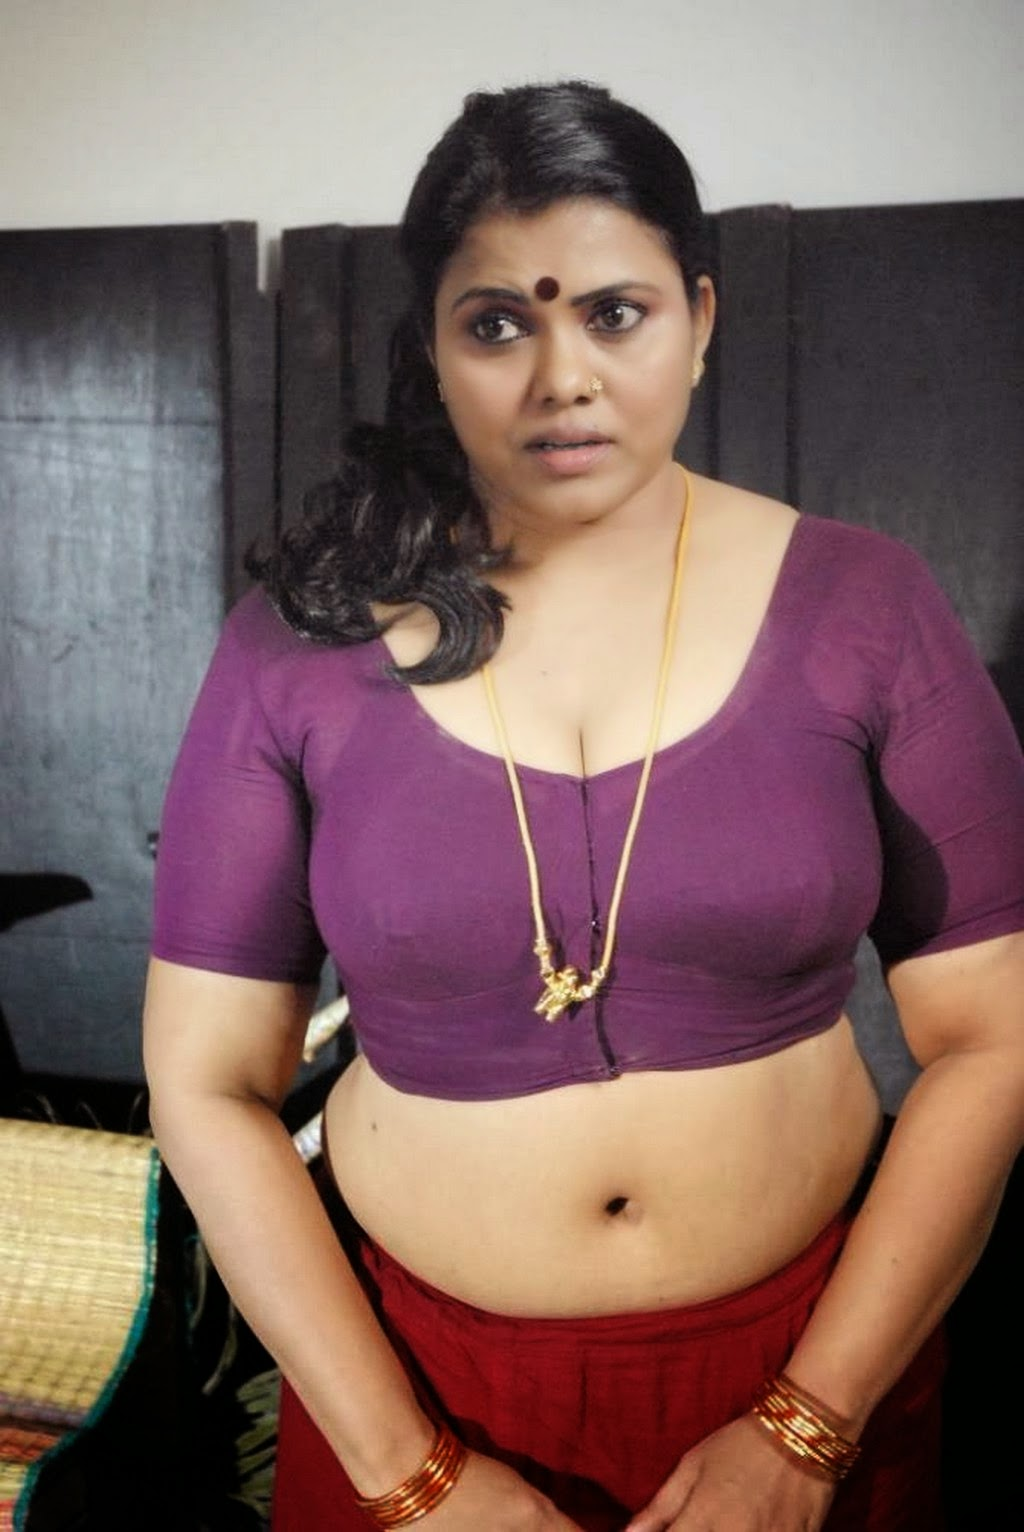 Tamil Desi Mallu Aunty Blouse Show Photos, Tamil Old Aunty -1175